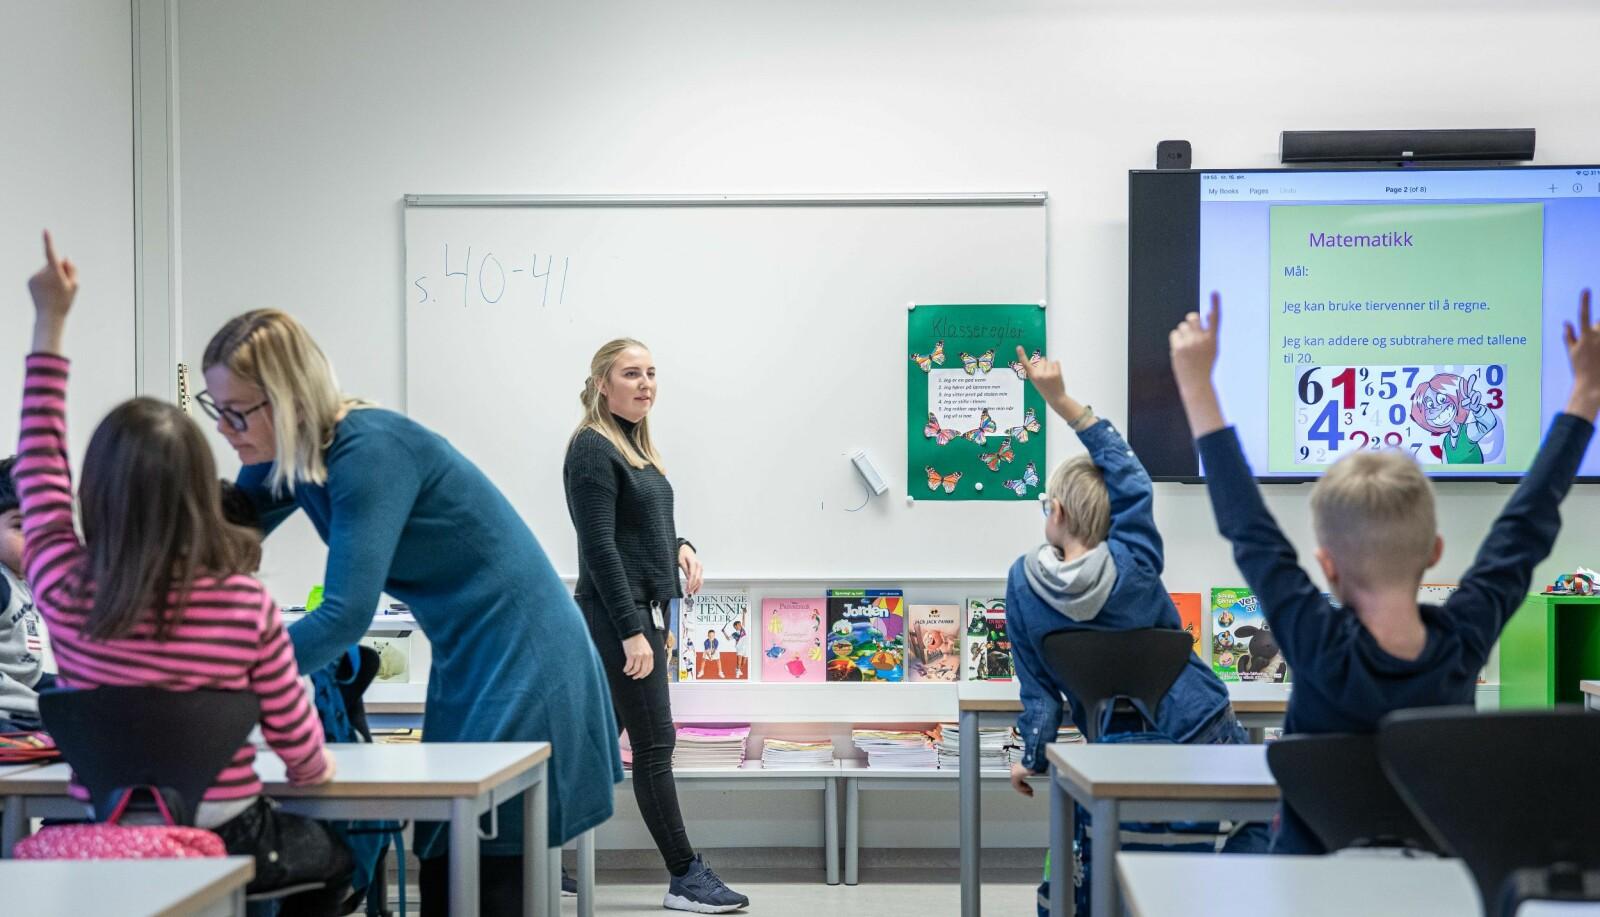 Andre klasse på Berger skole. Hovedlærer Astri Bartnes og studentlærer Margrethe Hellerud. Foto: Siri Øverland Eriksen